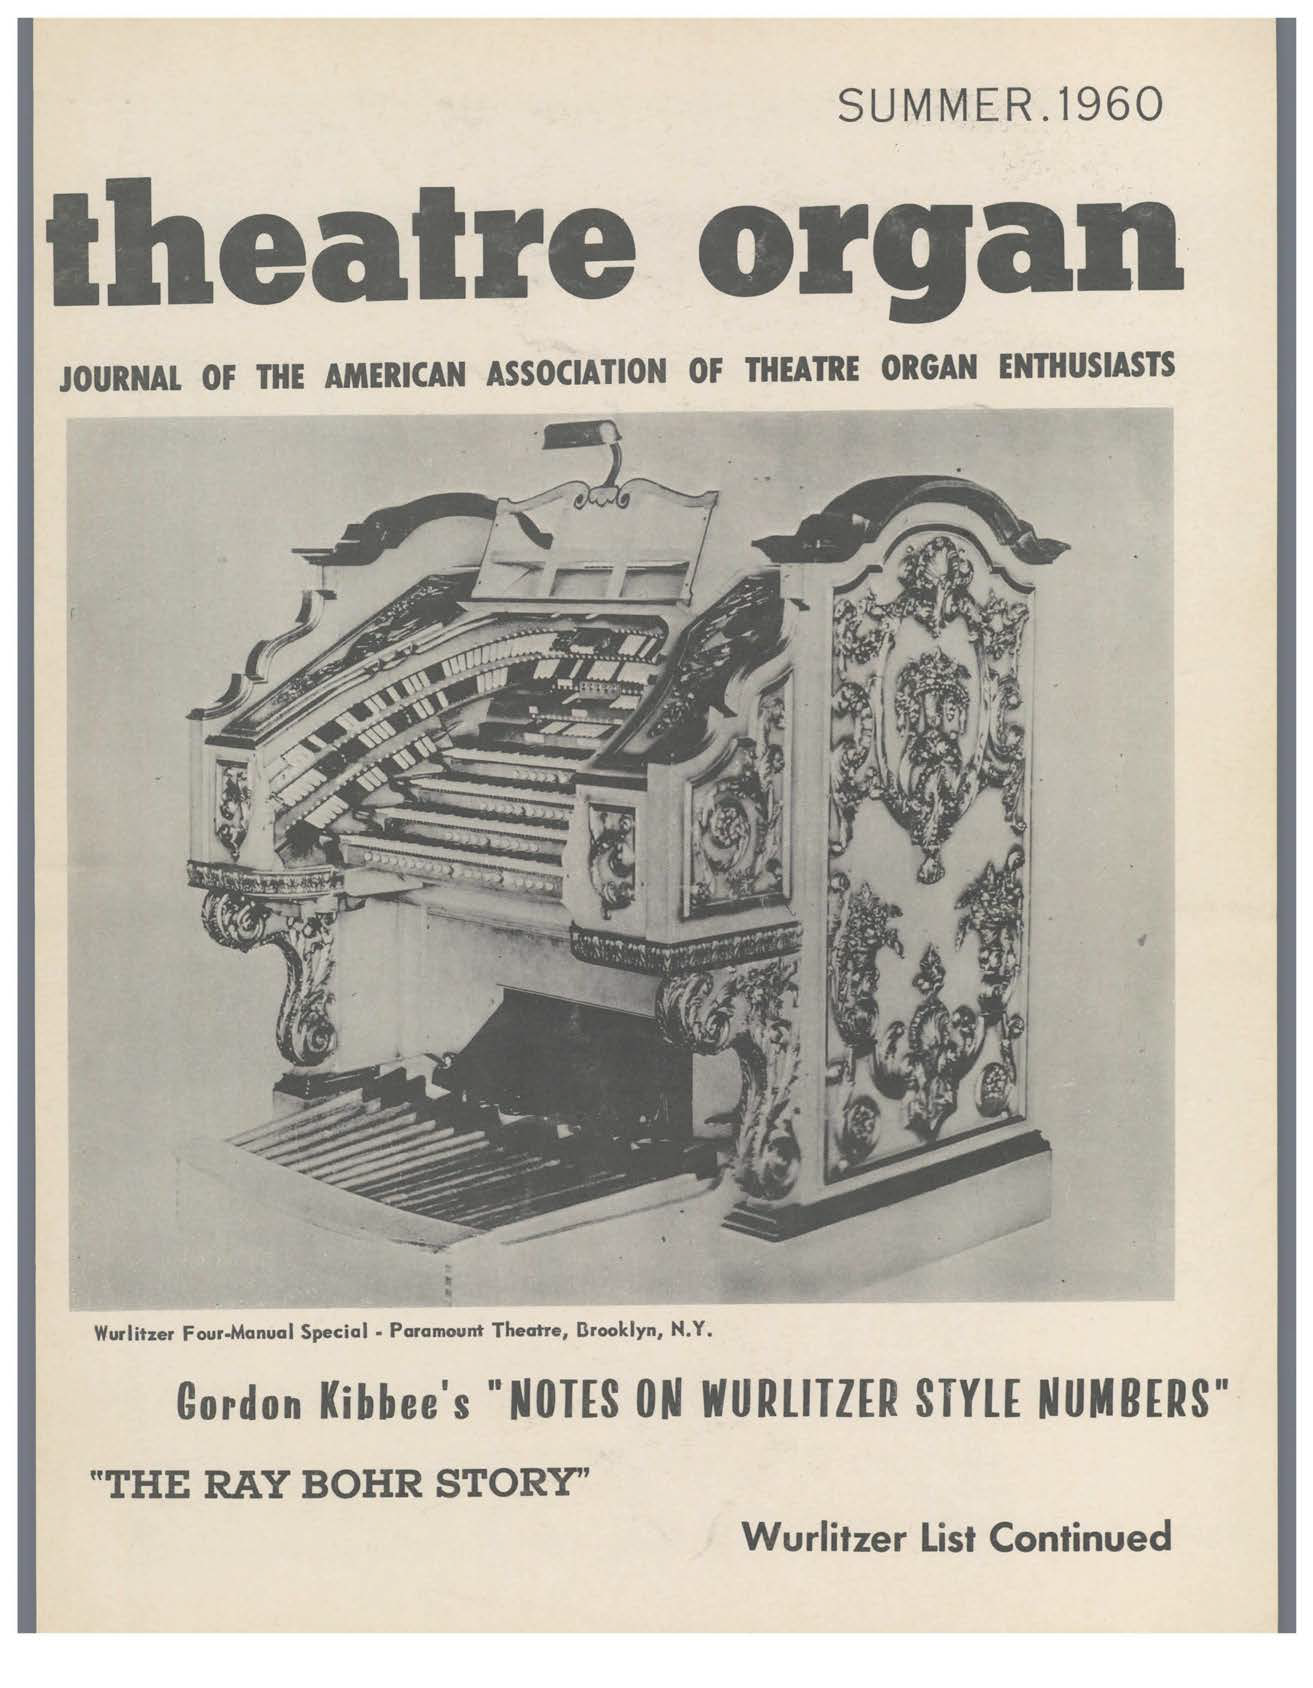 Theatre Organ, Summer 1960, Volume 2, Number 2